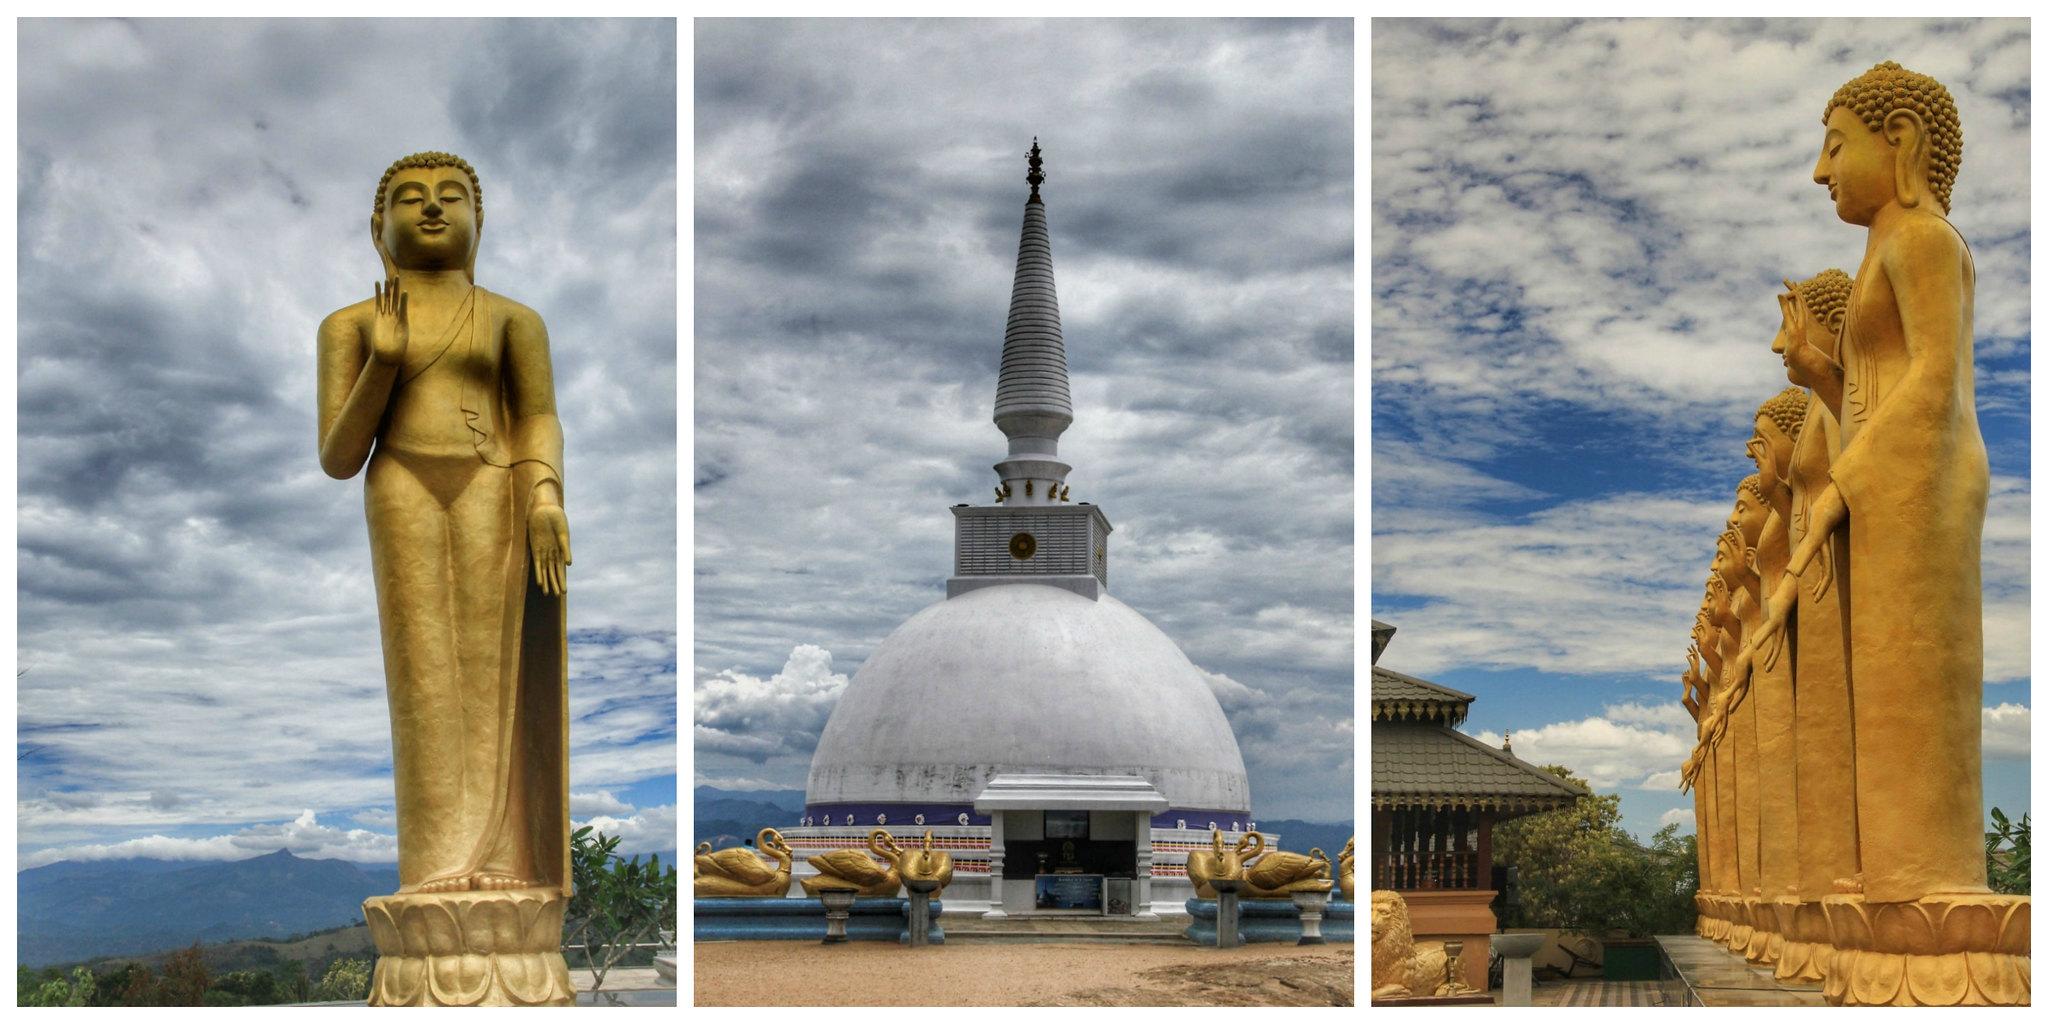 Nelligala International Buddhist Centre, Kandy